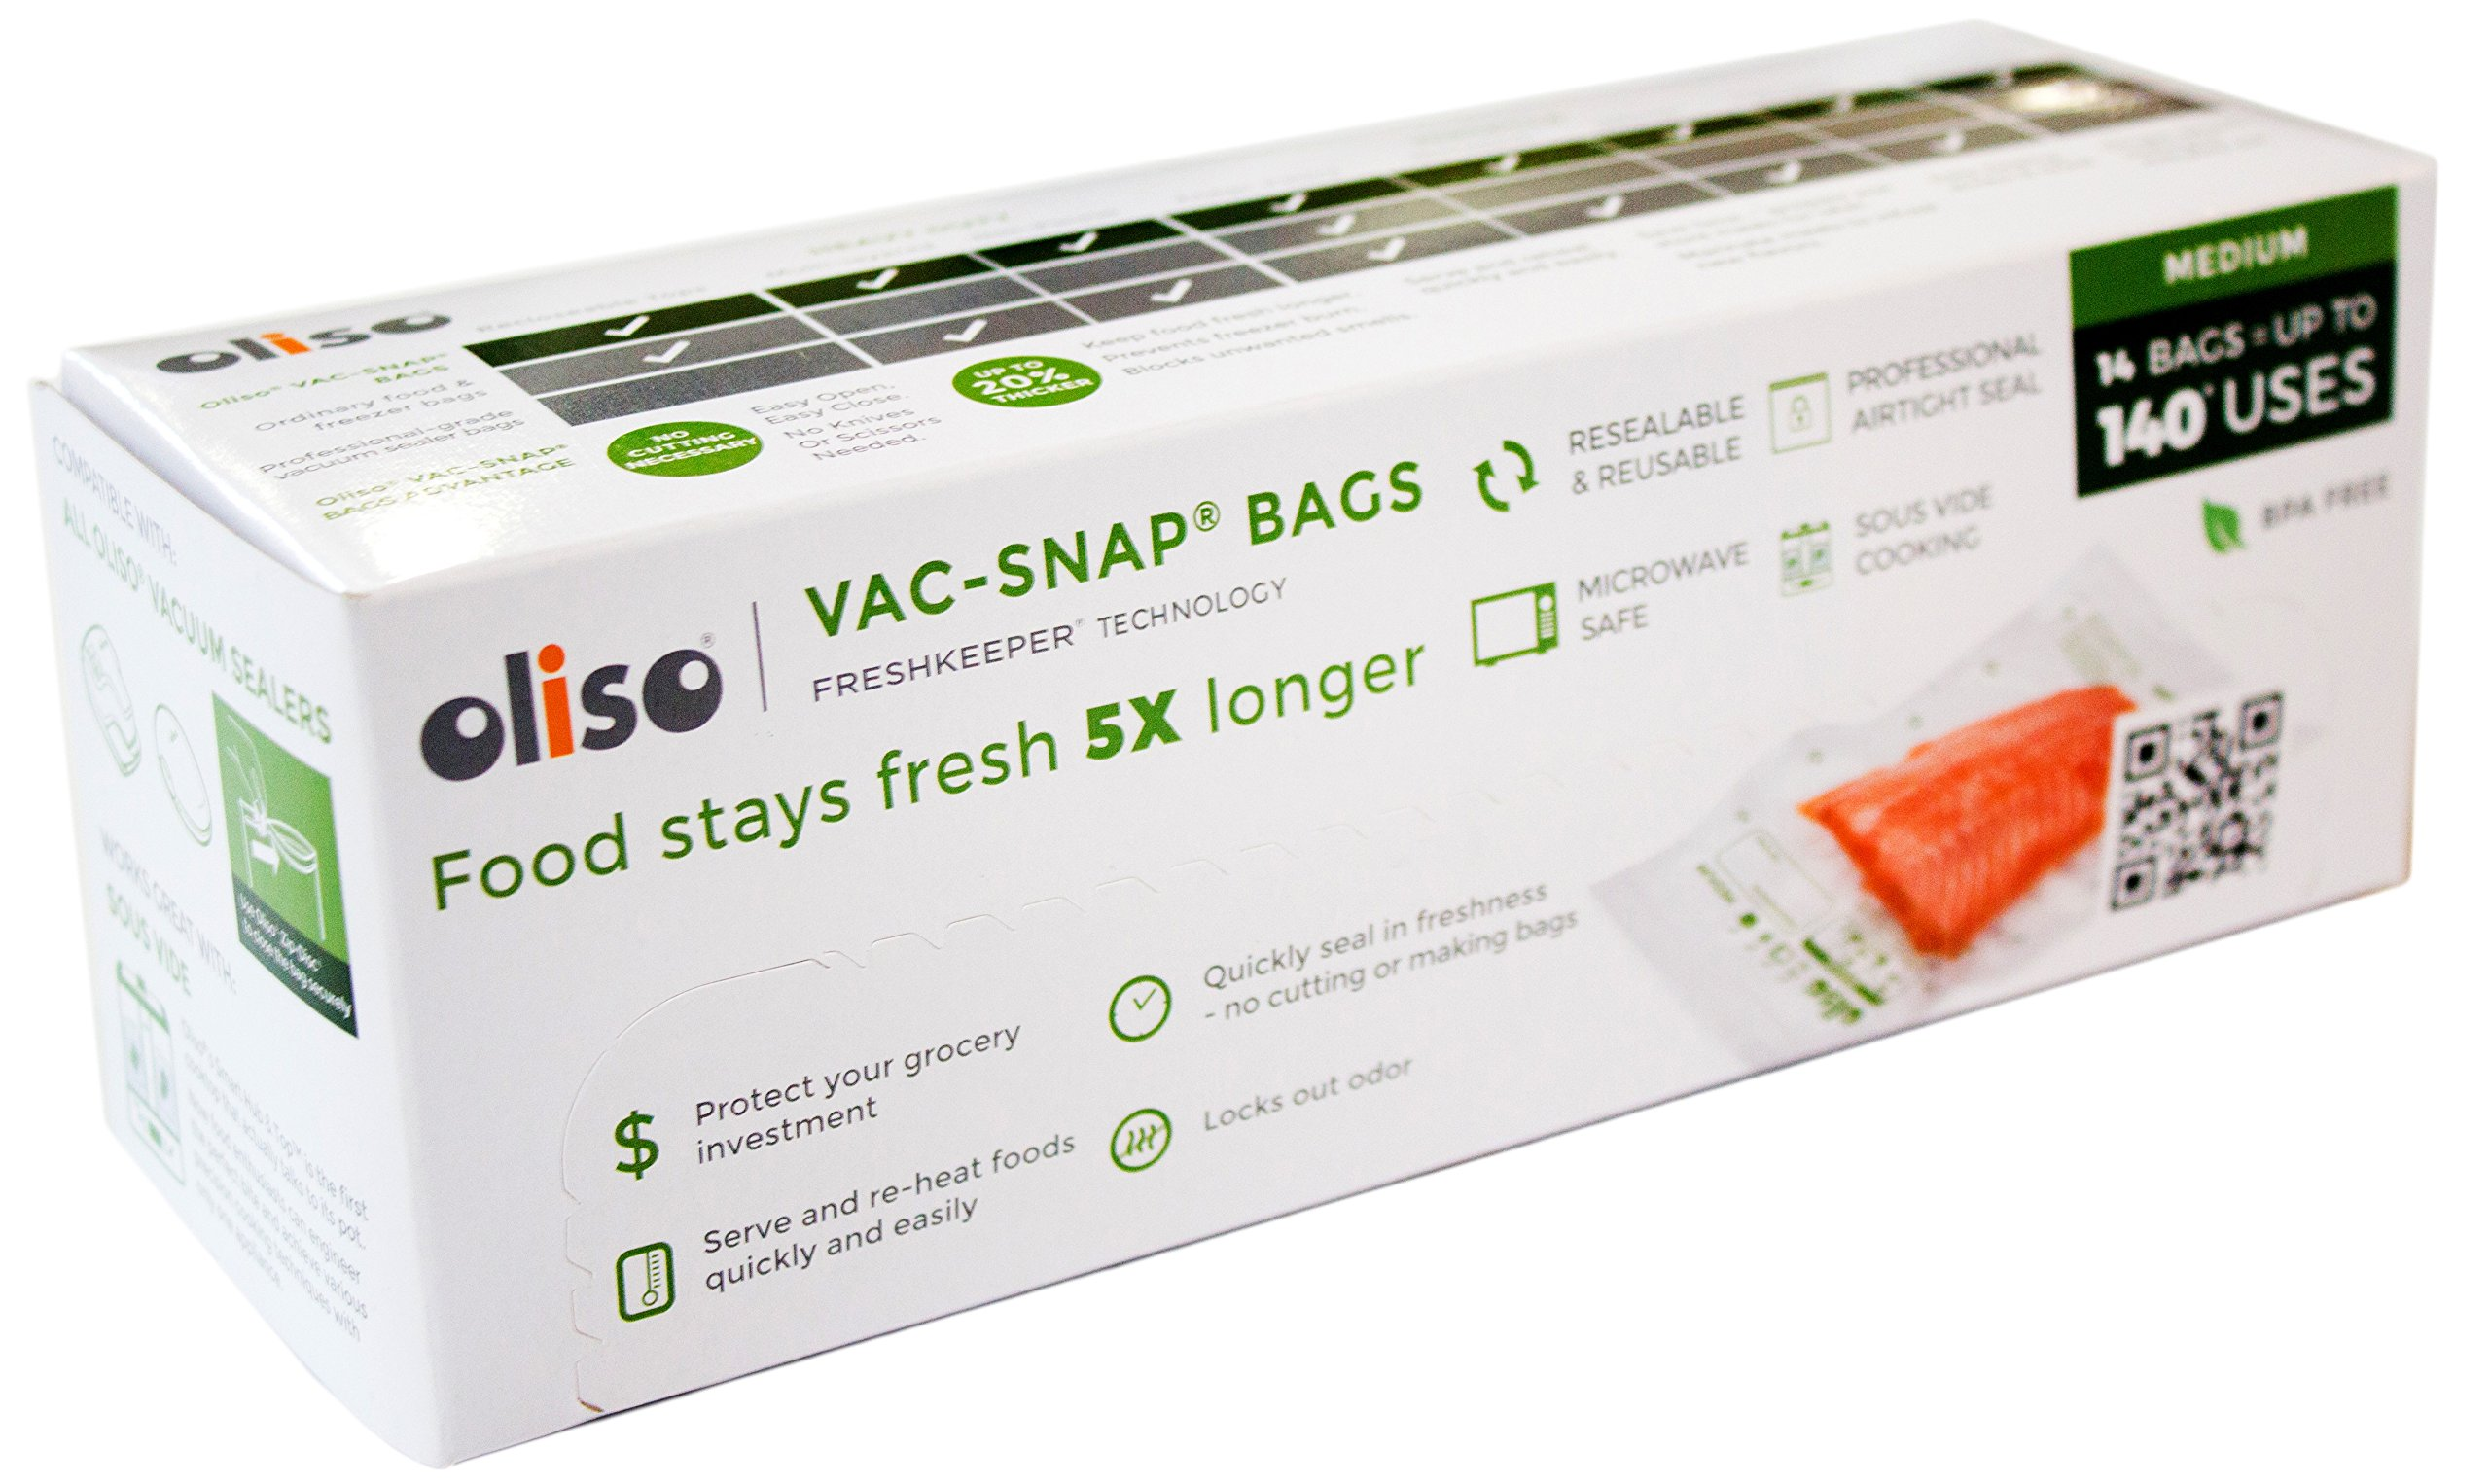 Oliso Pro VAC-SNAP Bags for Oliso Vacuum Sealers, Medium, 1 Quart, 14 Bags by Oliso